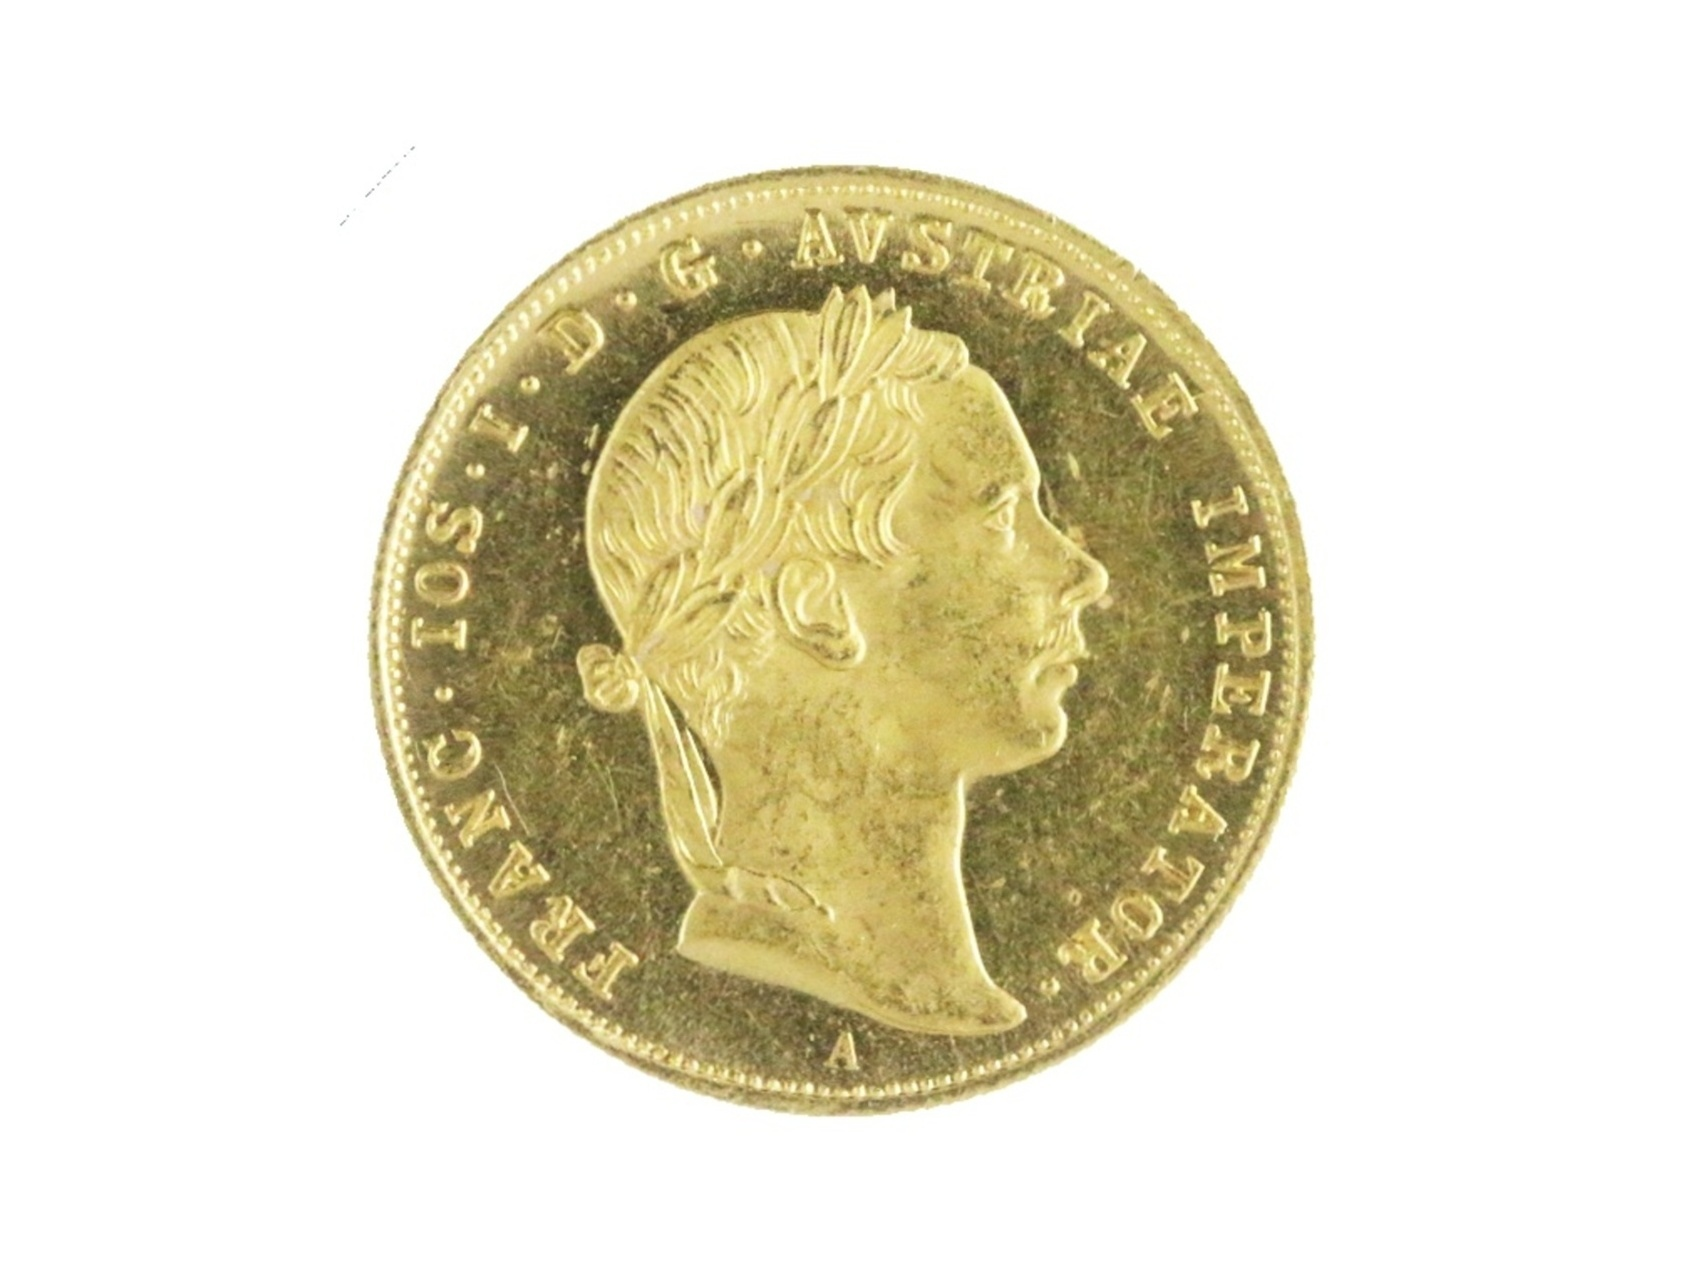 František Josef I. 1848-1916 - Dukát 1857 A, N106